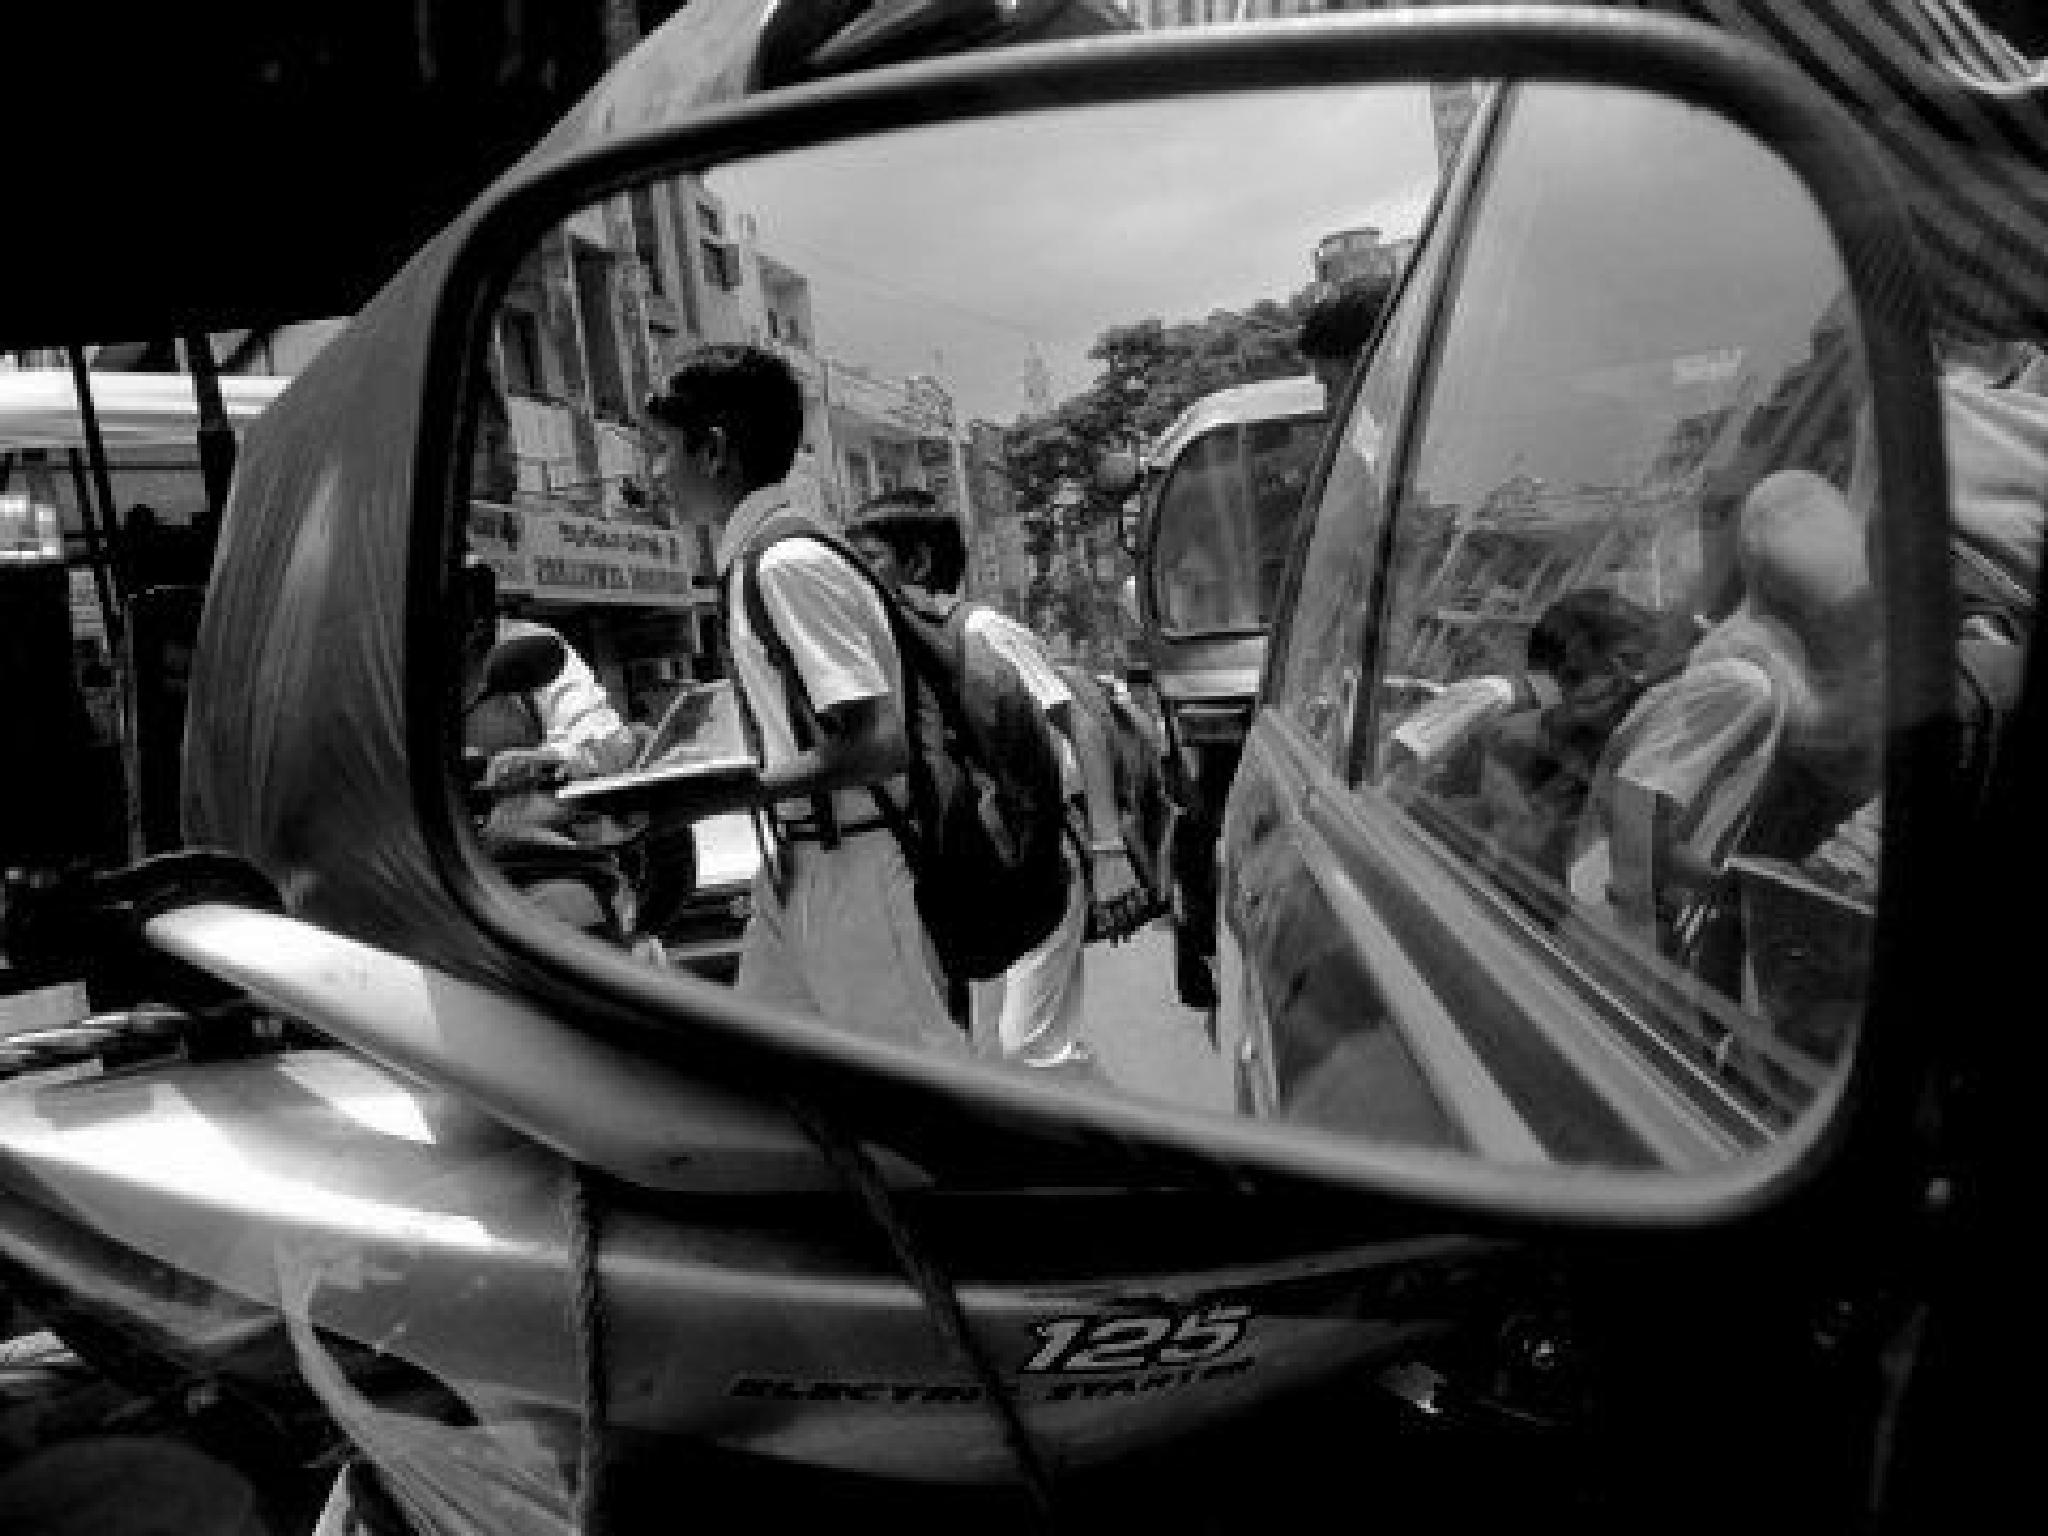 street photography -vanishing childhood  by annapoorna.sitaram